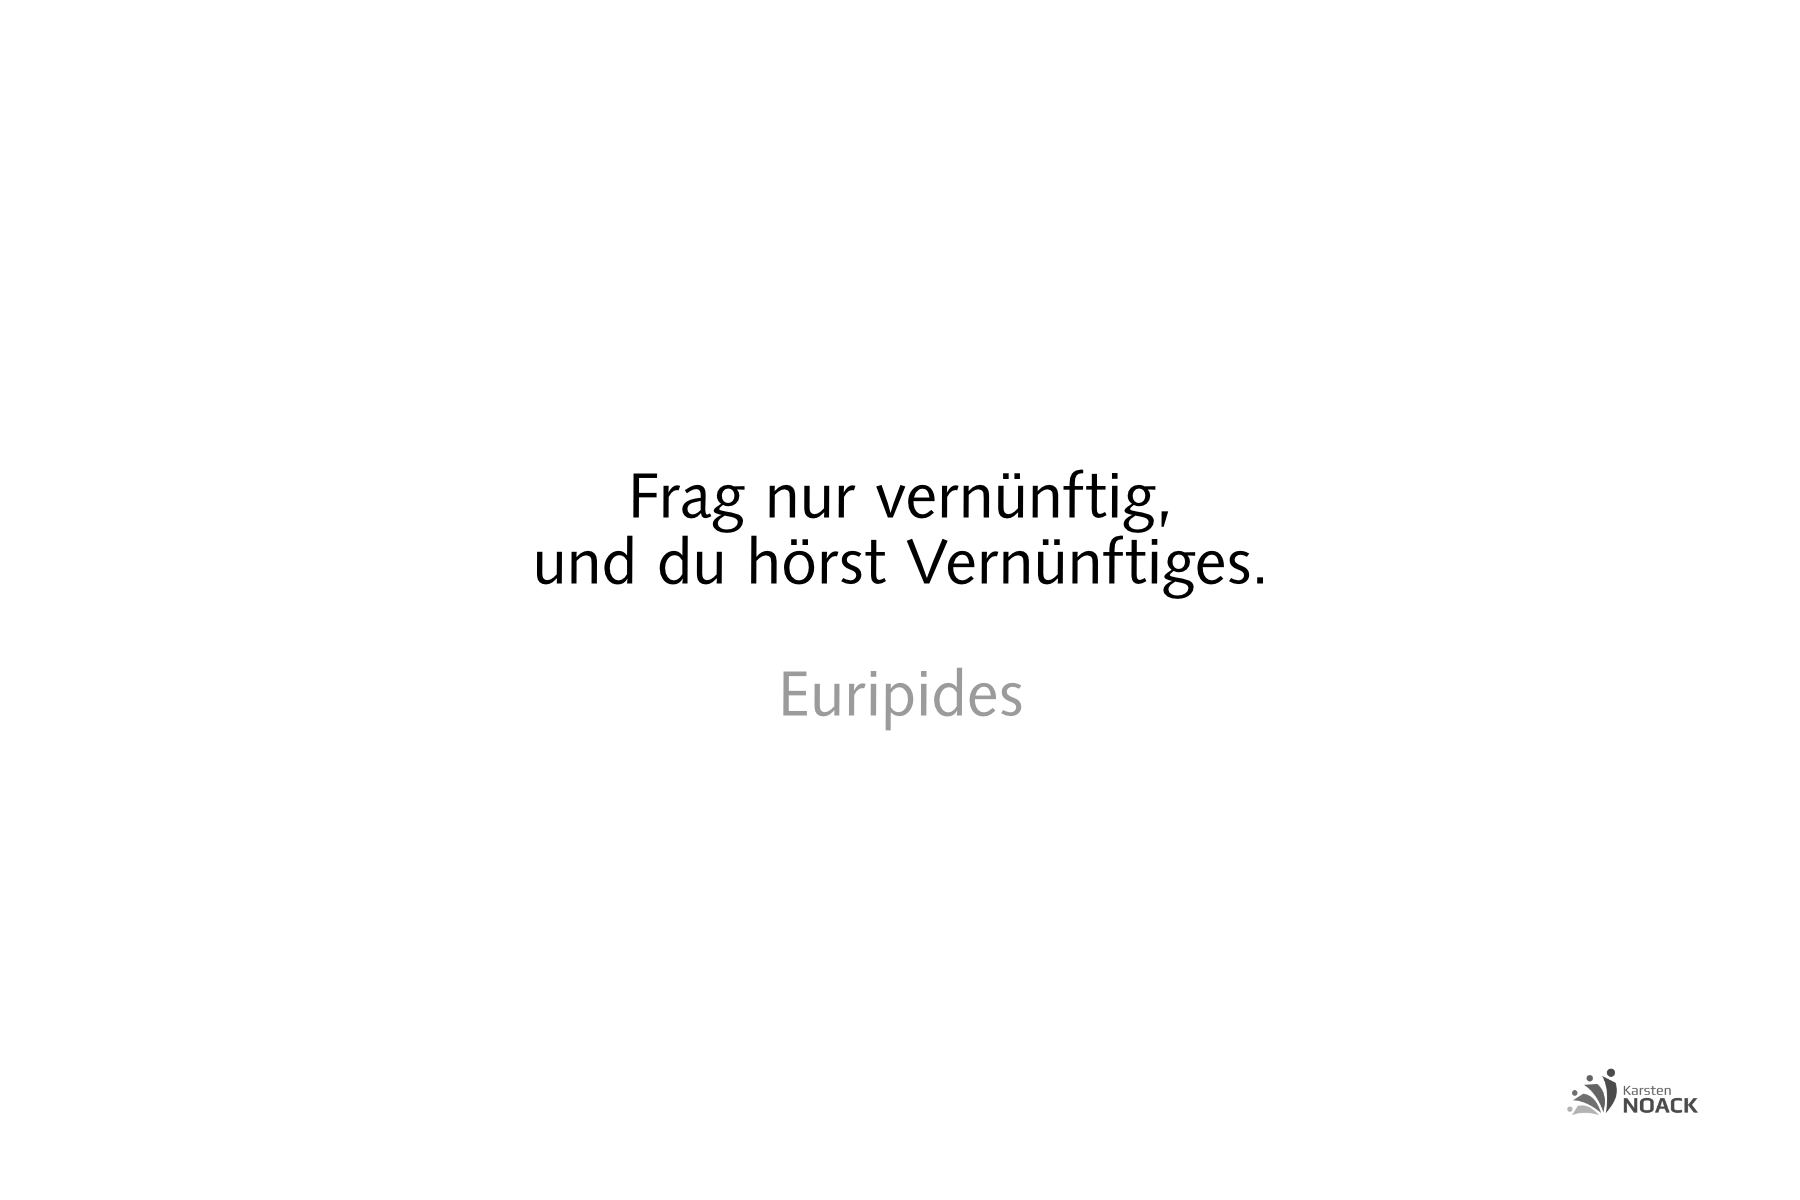 Frag nur vernünftig, und du hörst Vernünftiges. Euripides